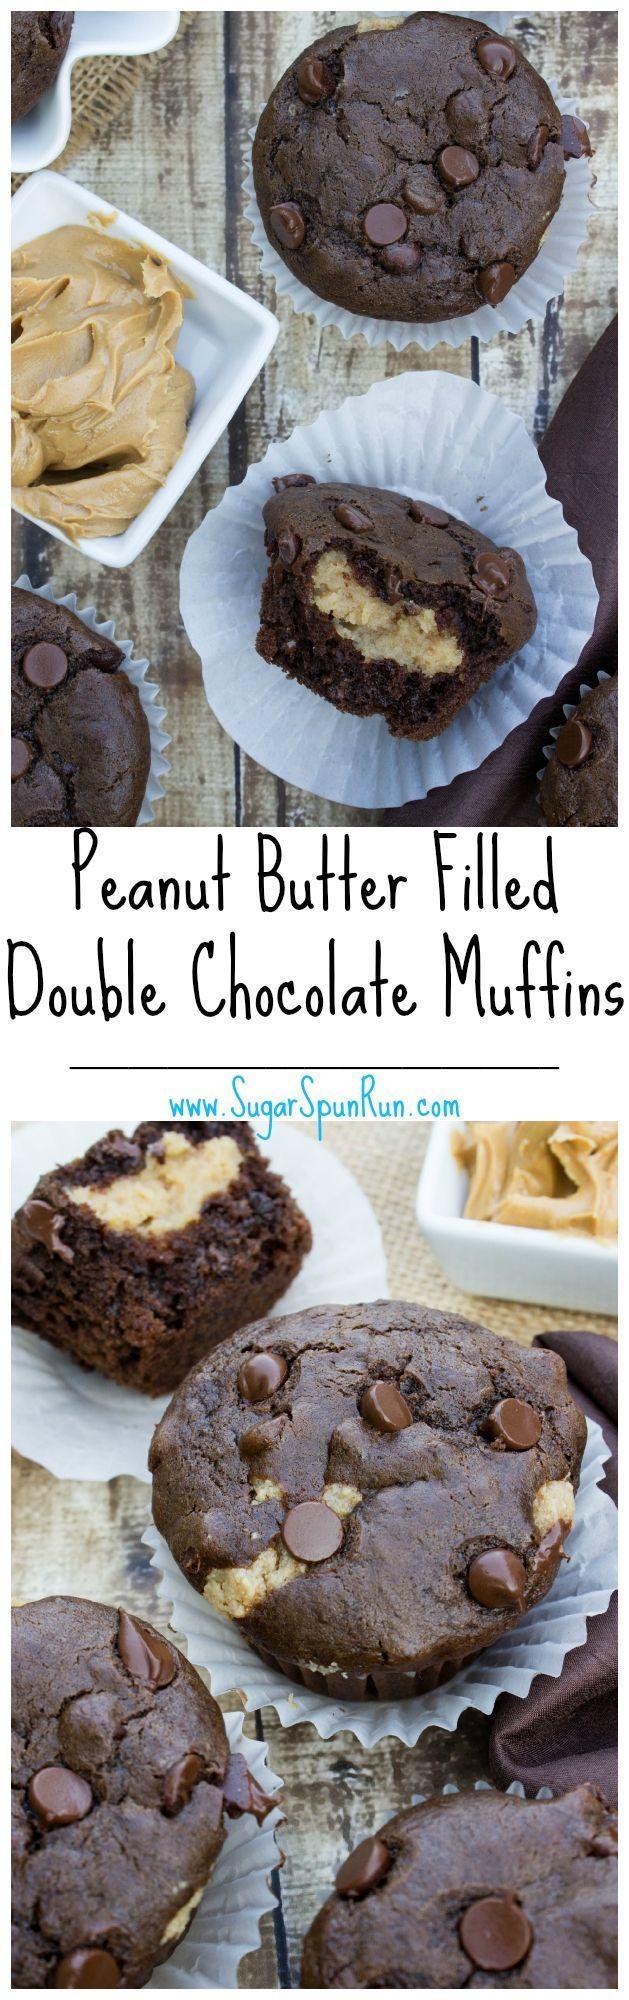 Peanut Butter Filled Chocolate Muffins